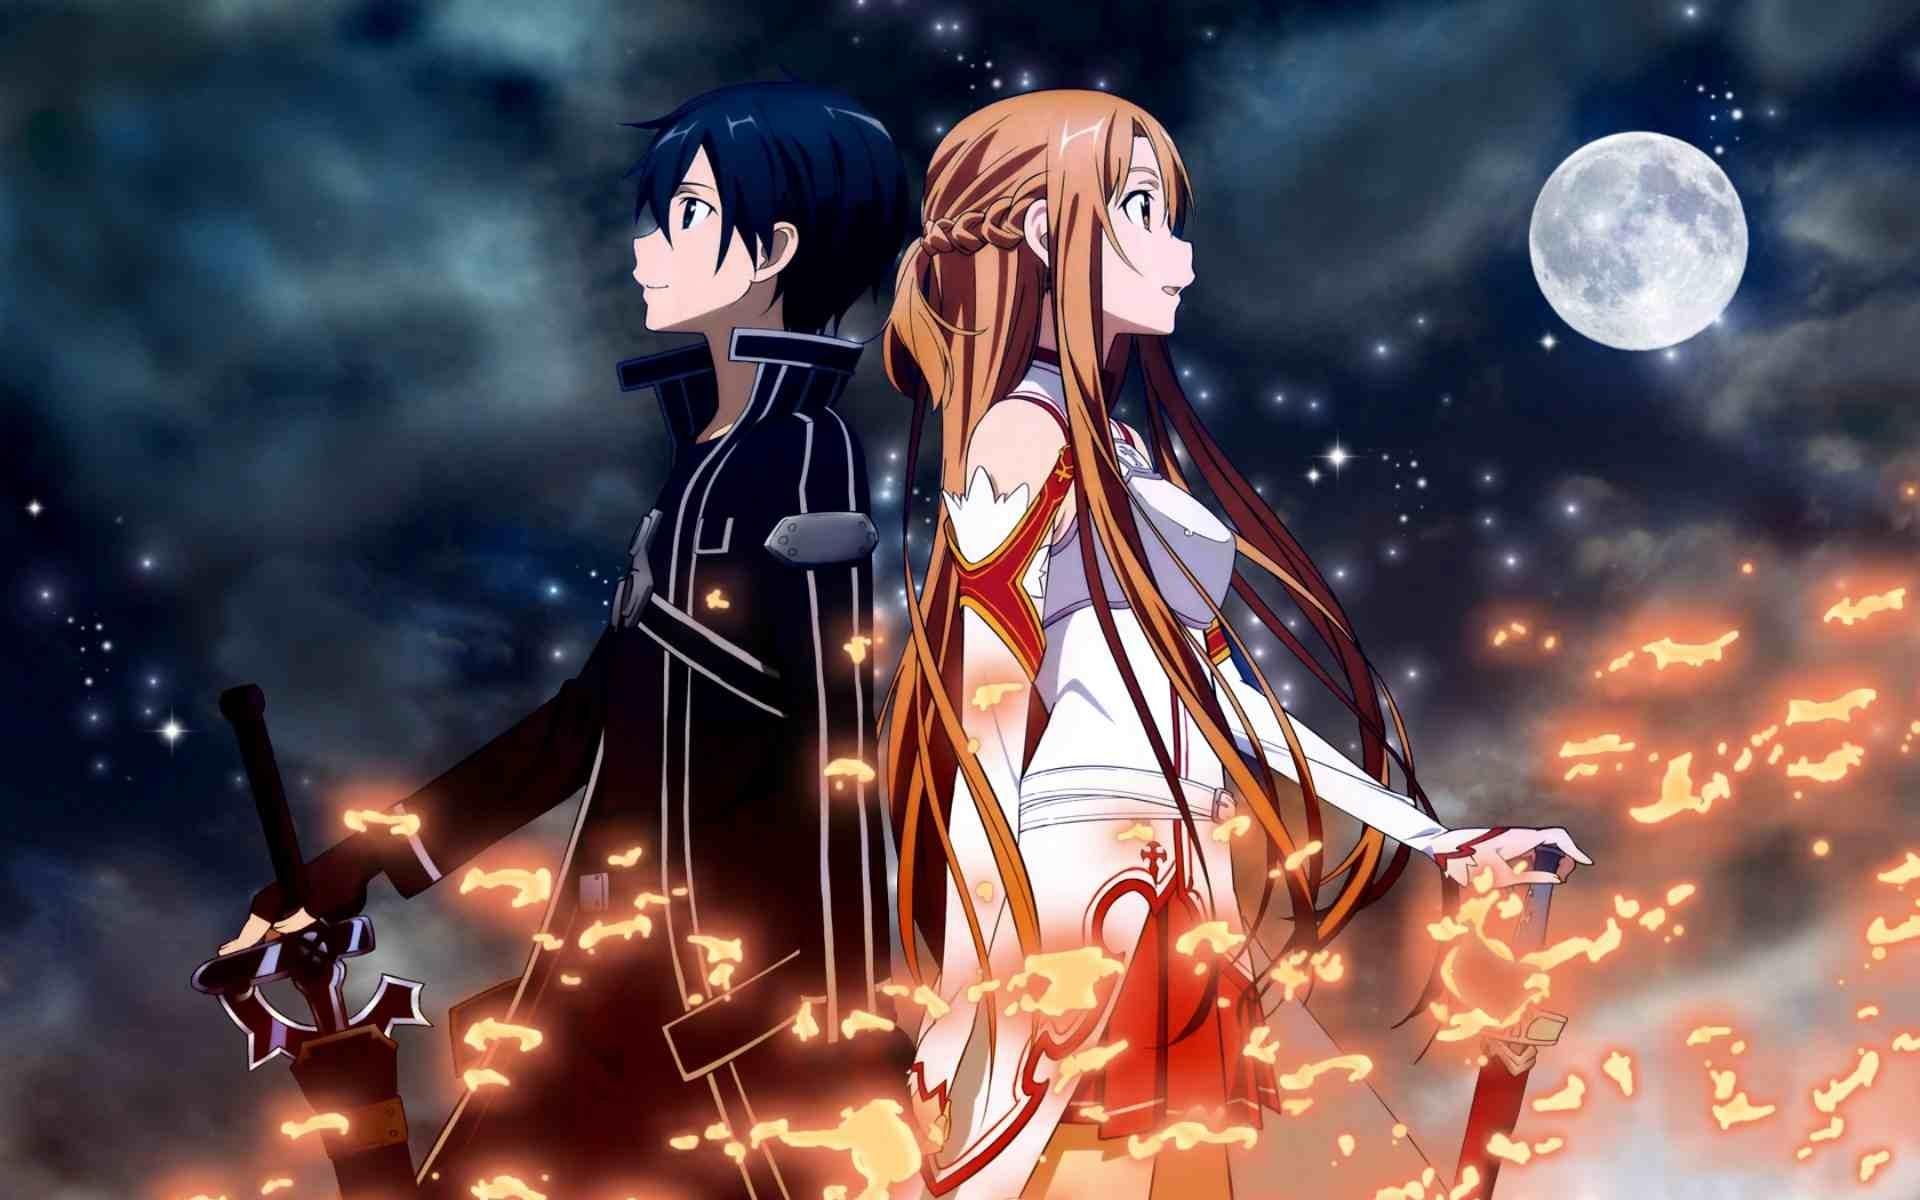 anime sword art online wallpapers (desktop, phone, tablet) - awesome